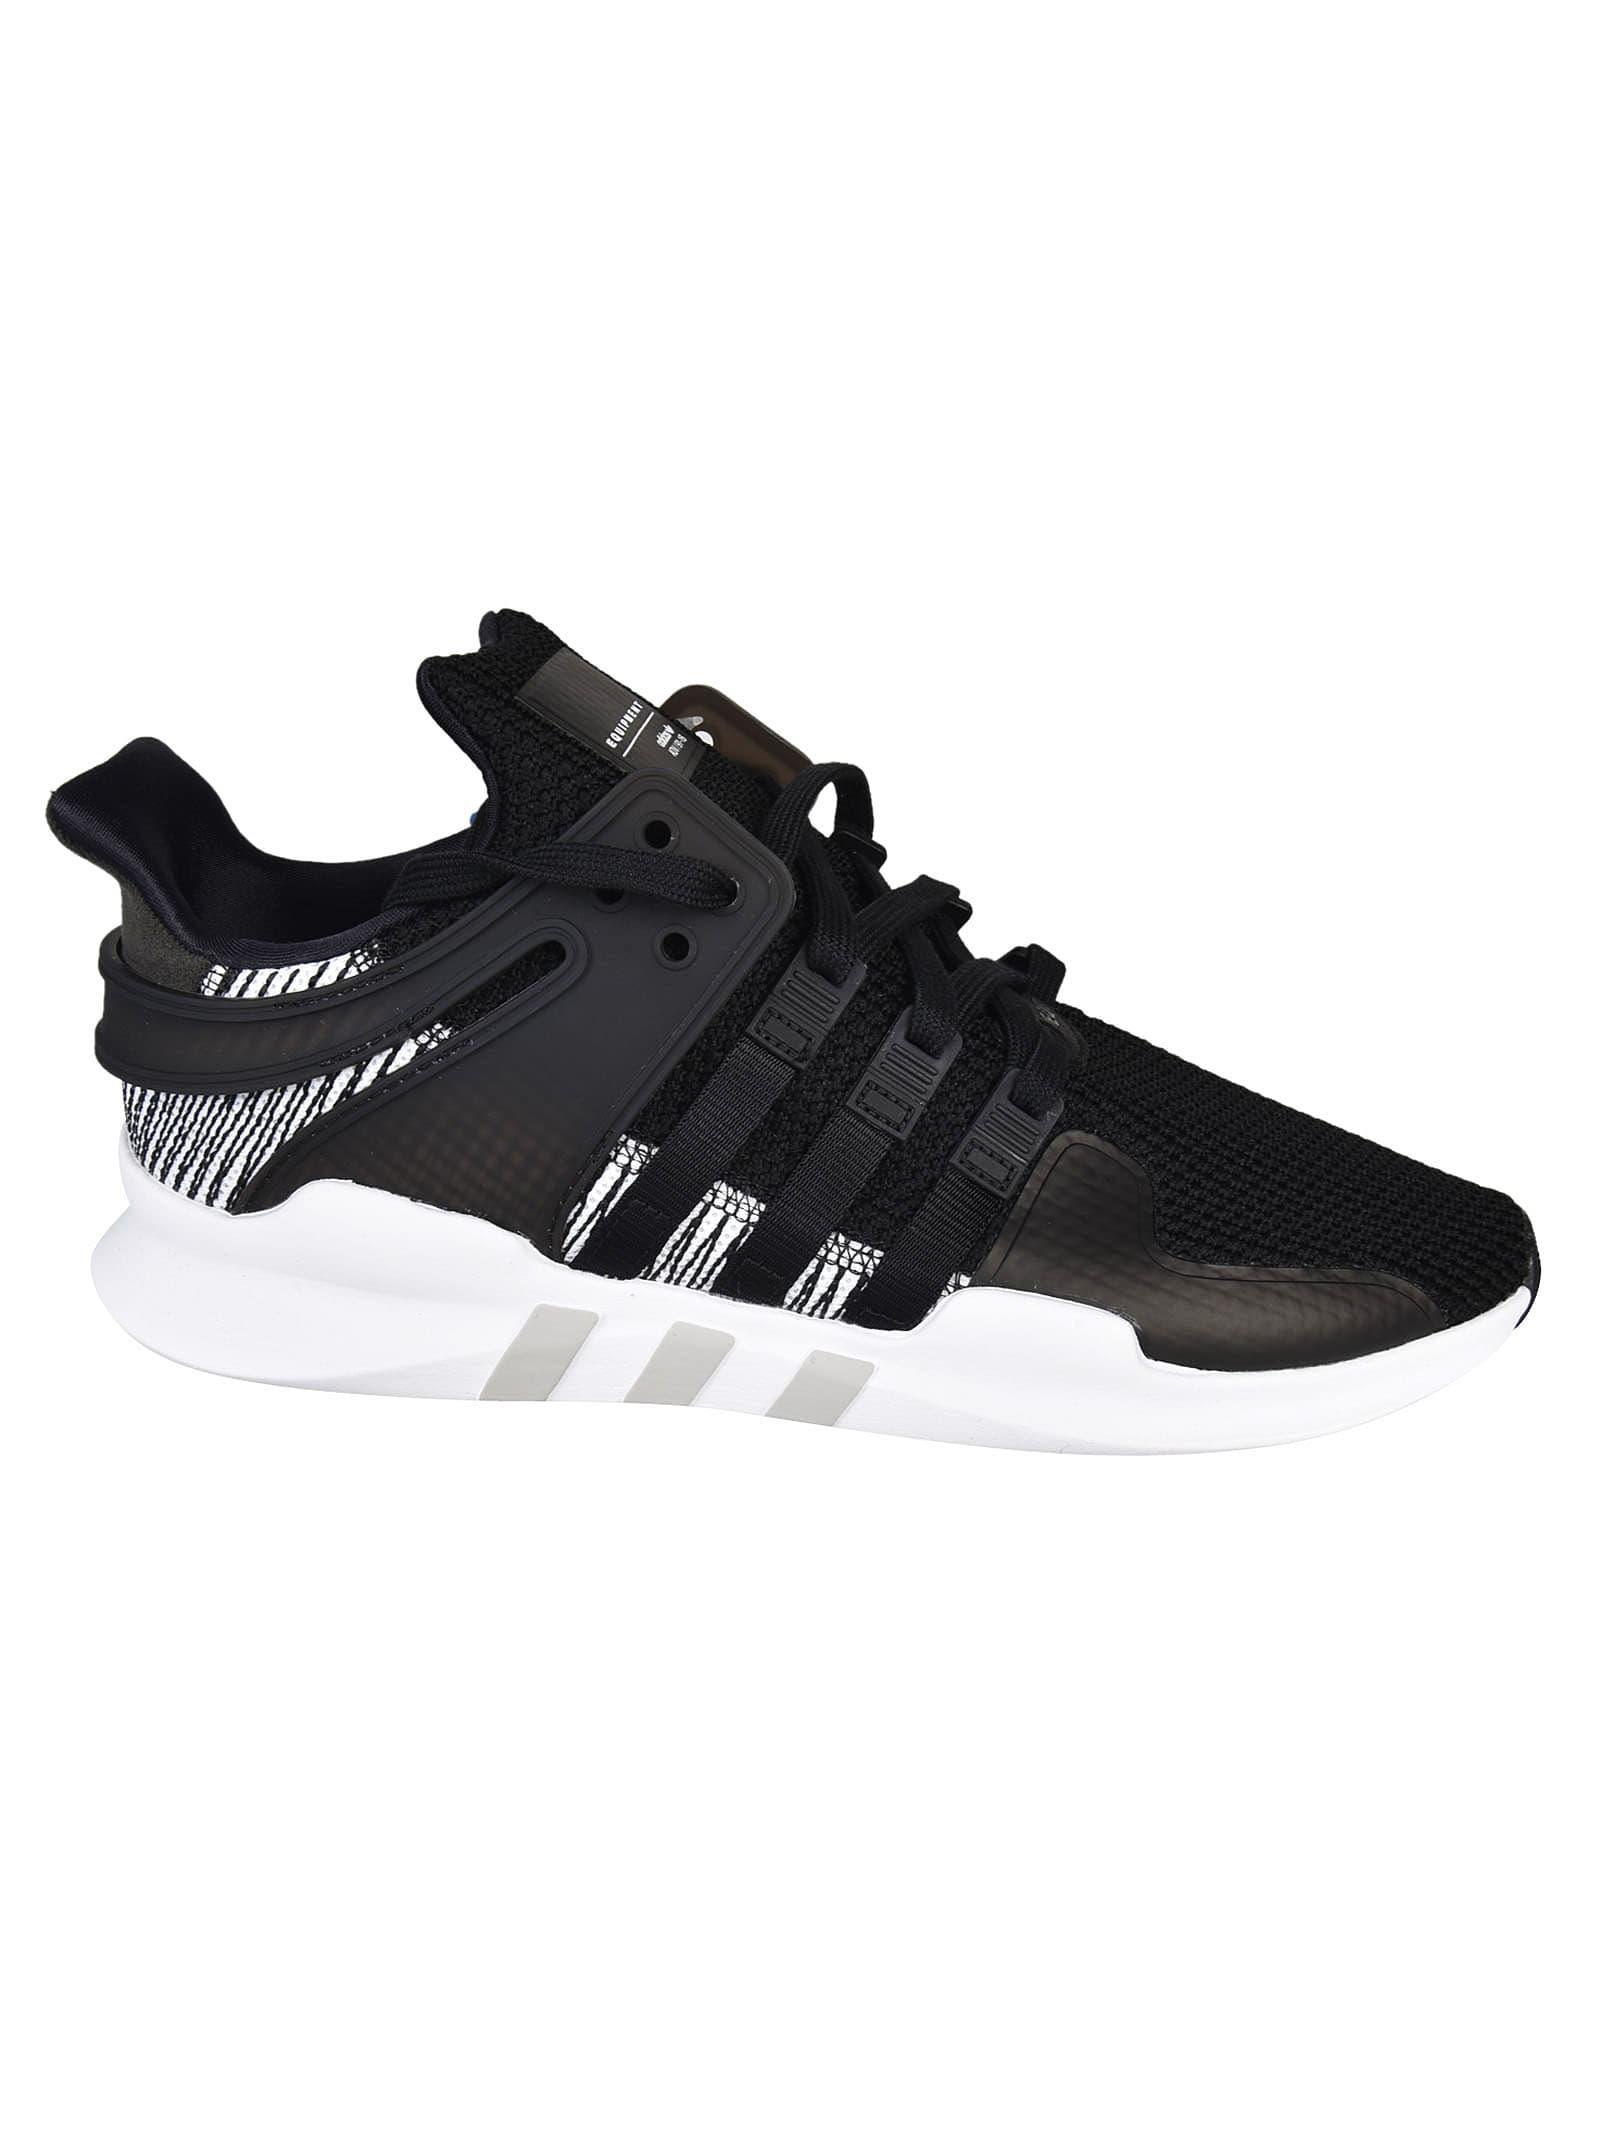 innovative design b8181 05796 Adidas Originals EQT Support ADV Sneakers